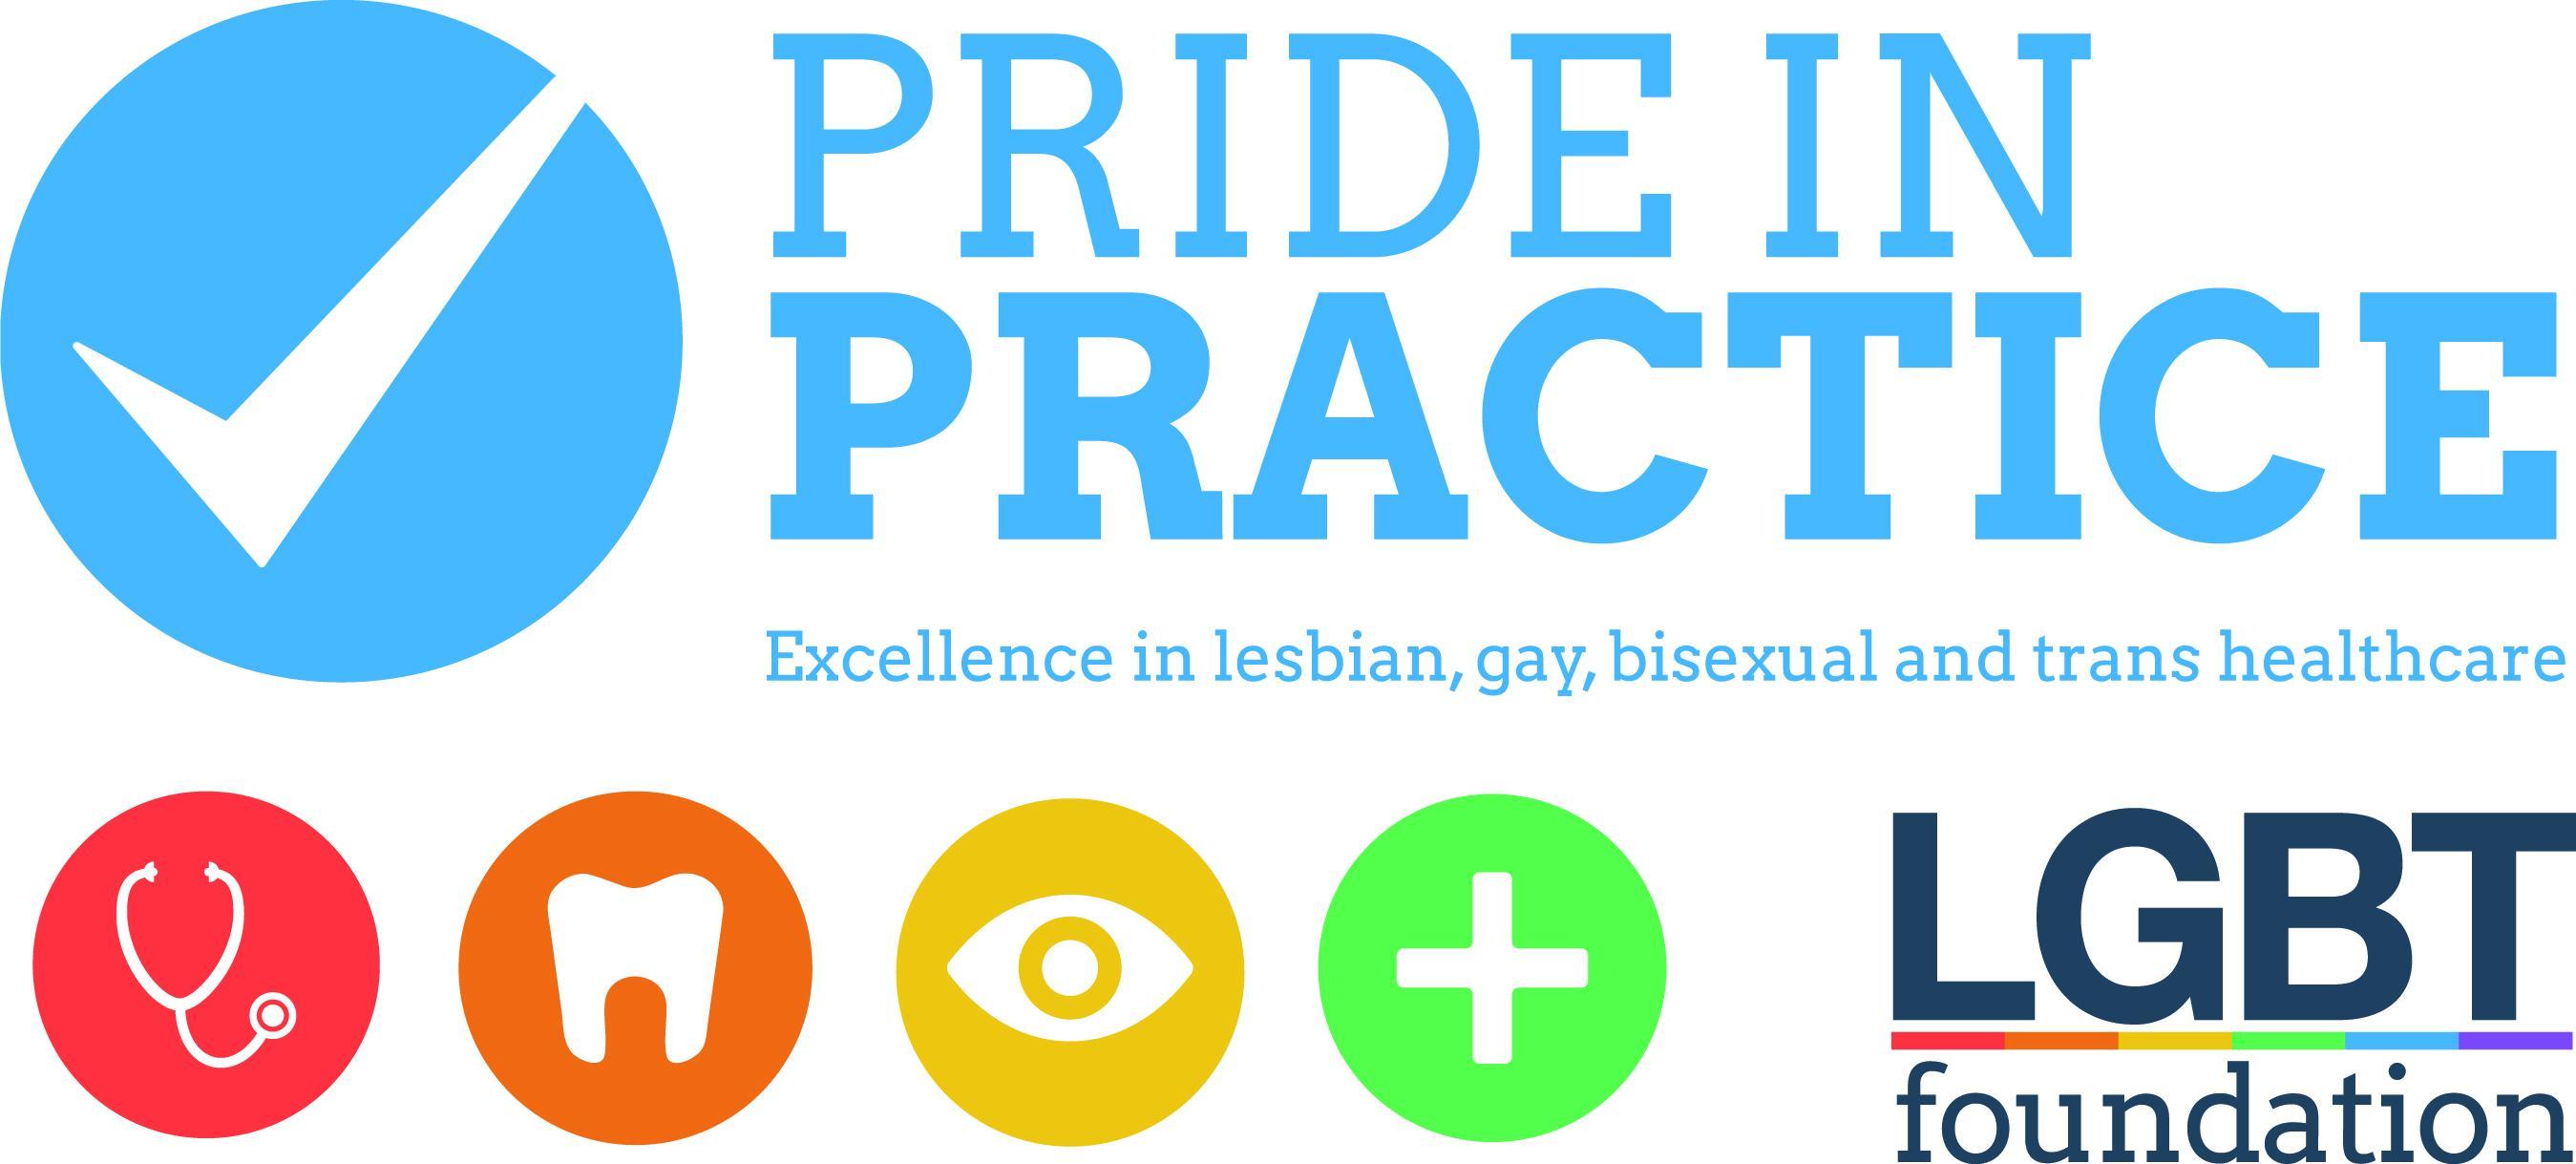 Pride and prejudice public attitudes toward homosexuality